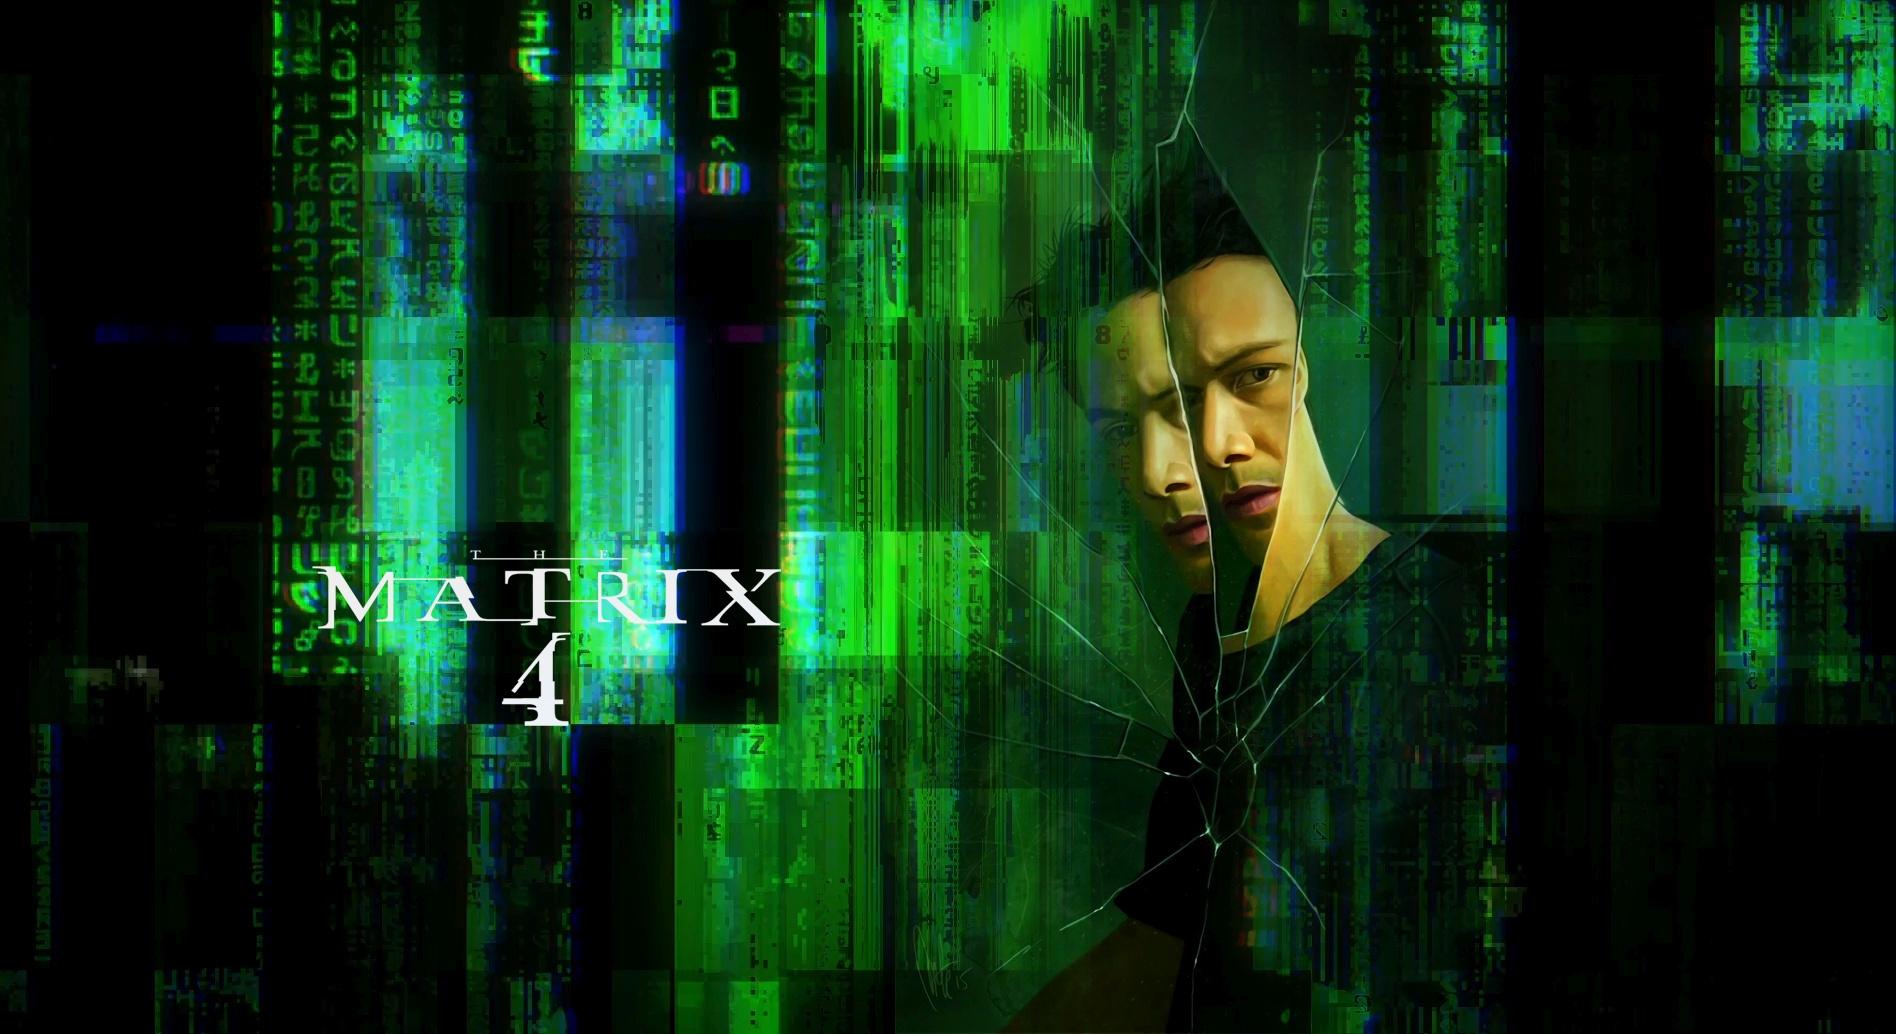 The Matrix 4 free image